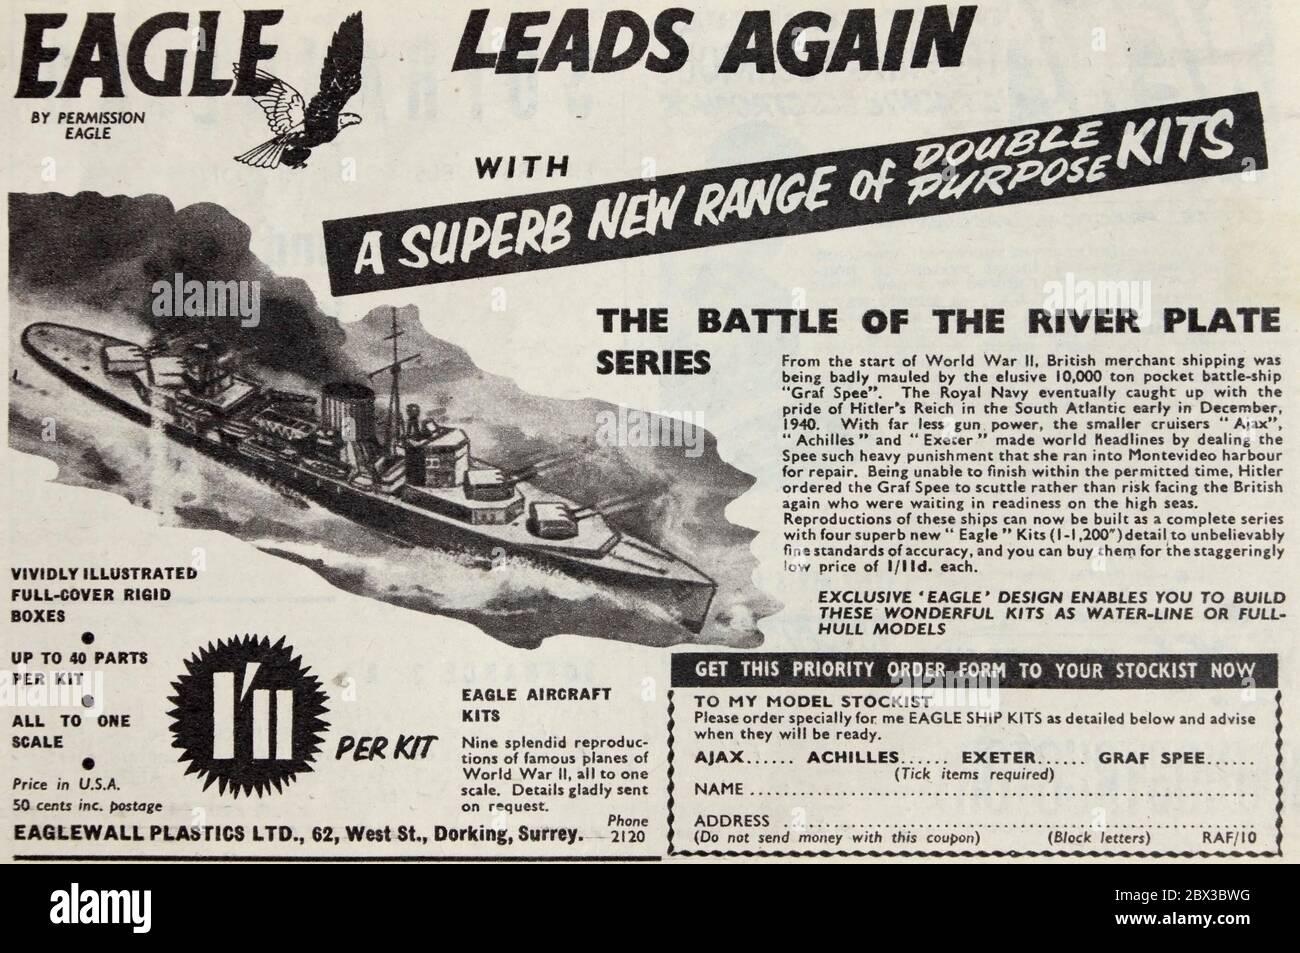 Vintage advertisement for Eaglewall plastic model kits. Stock Photo